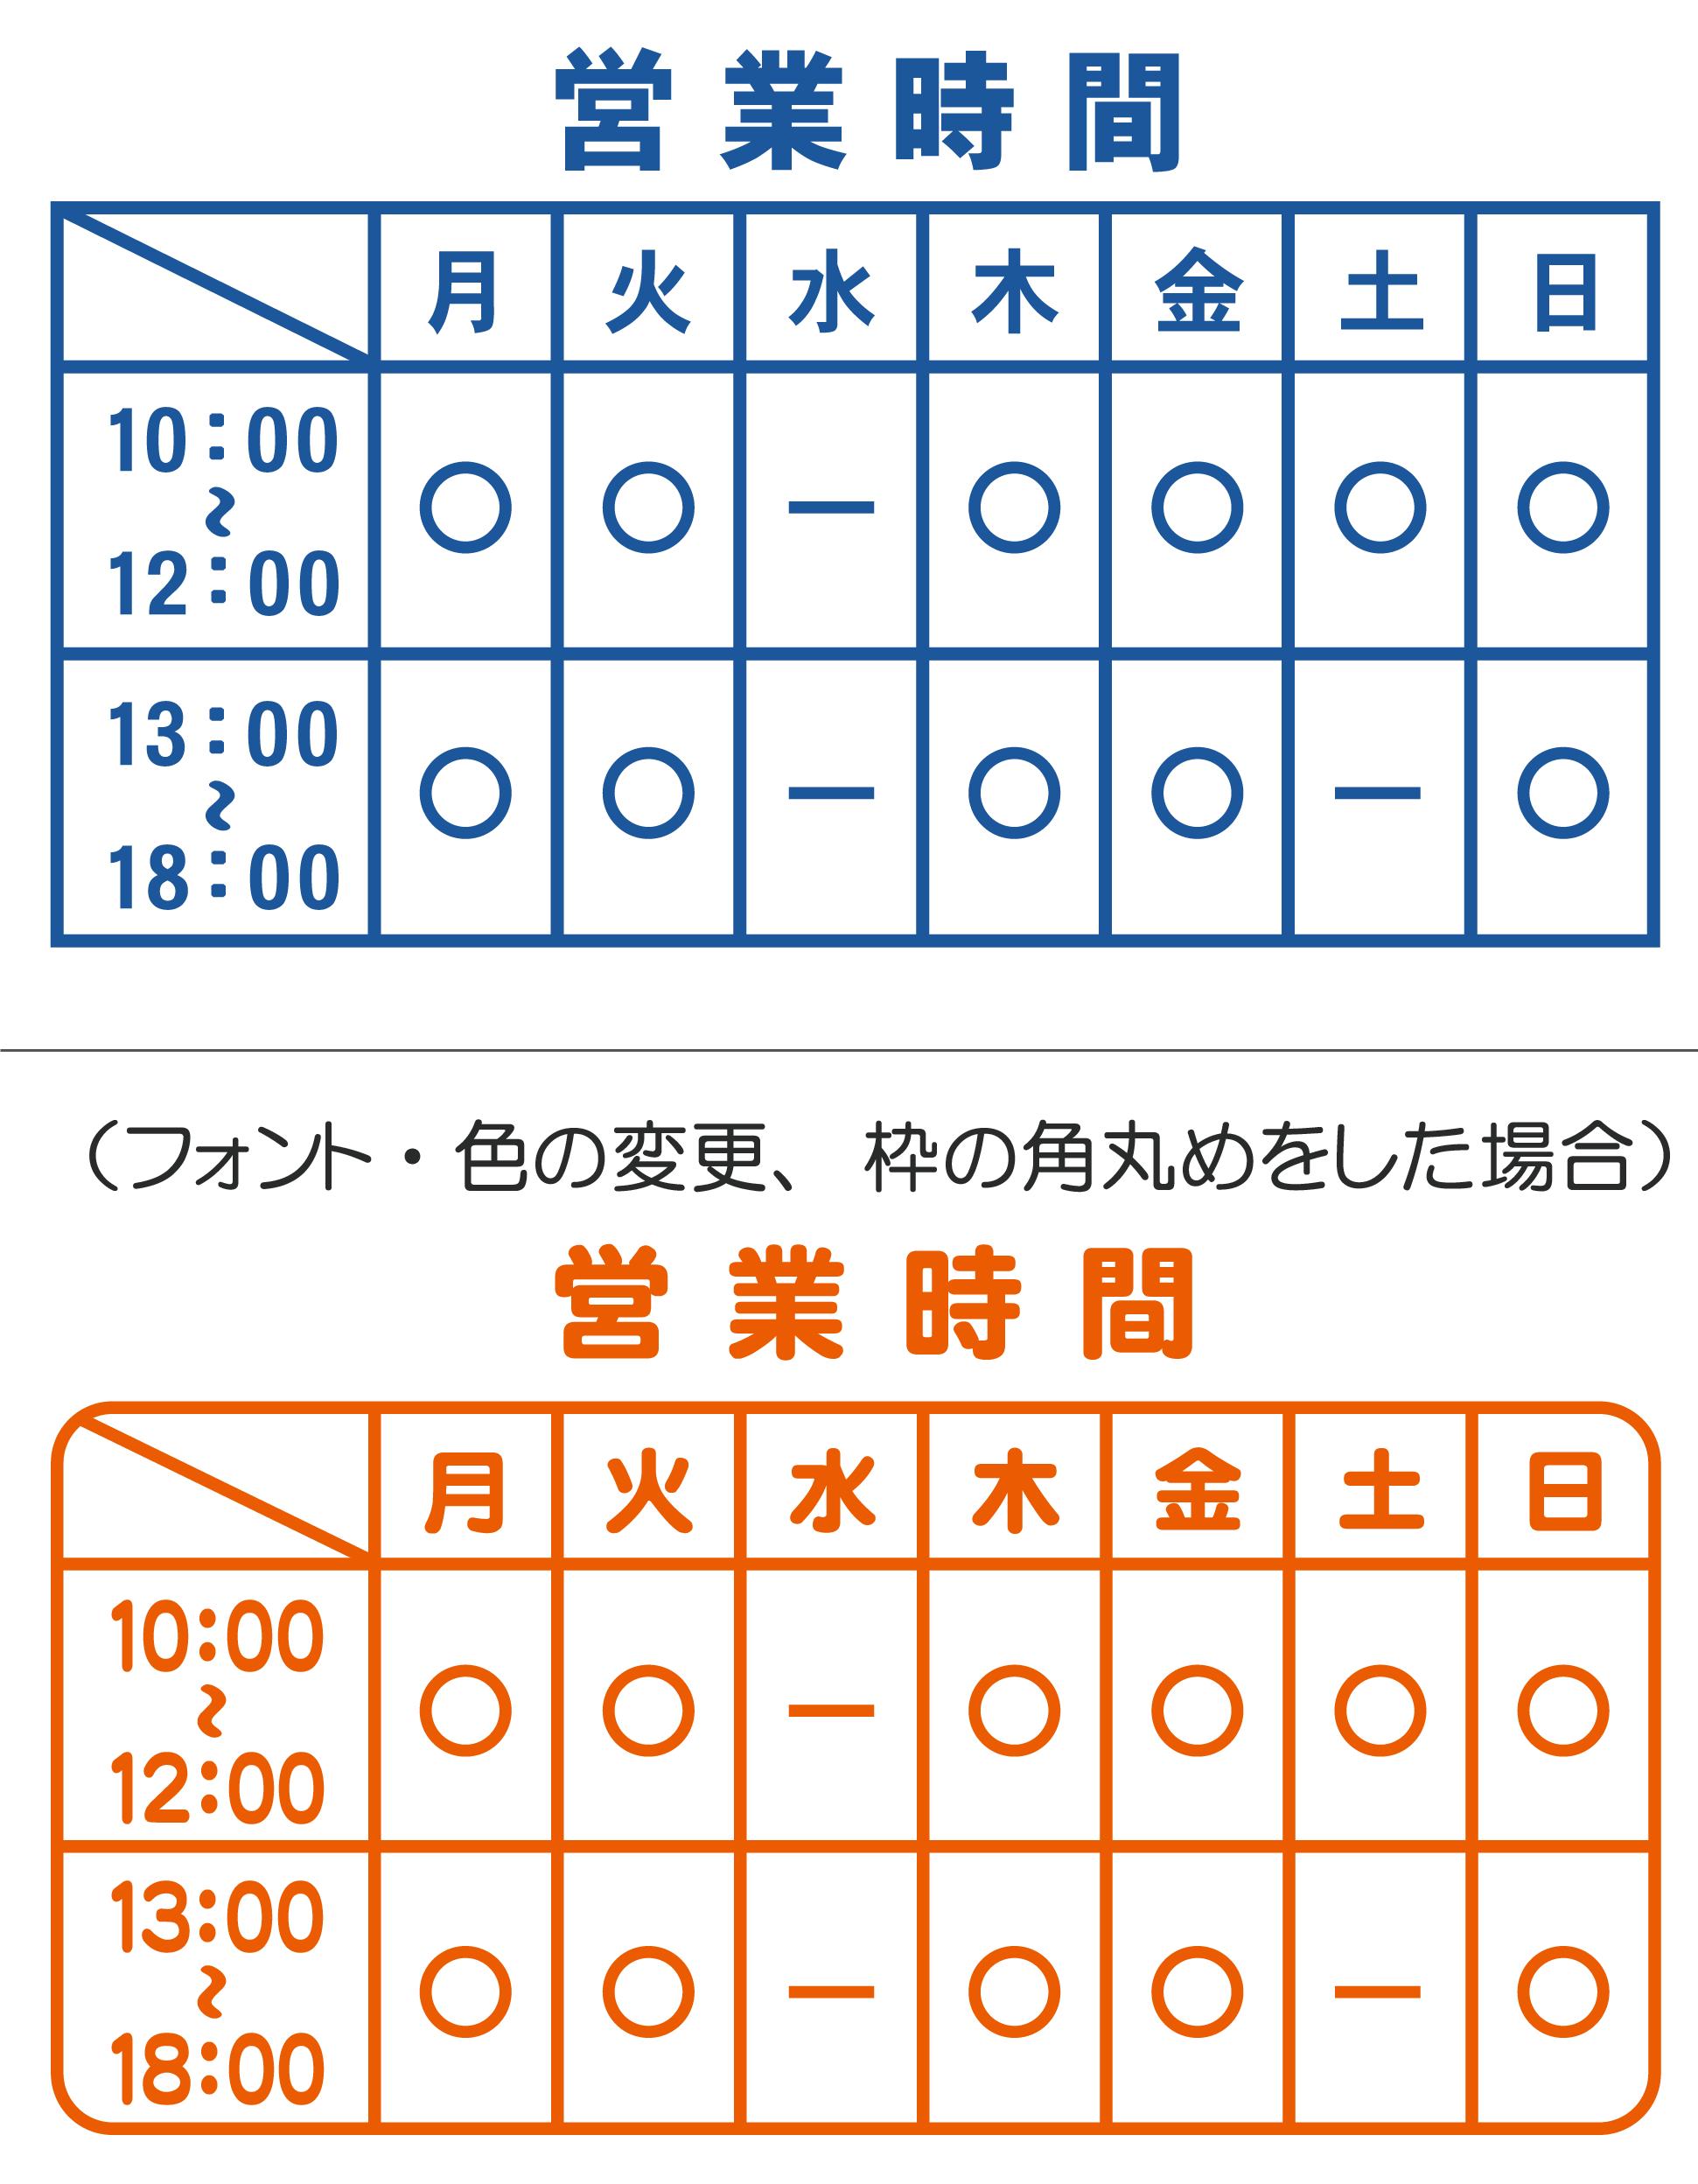 整骨院様向け 営業時間表 OP01